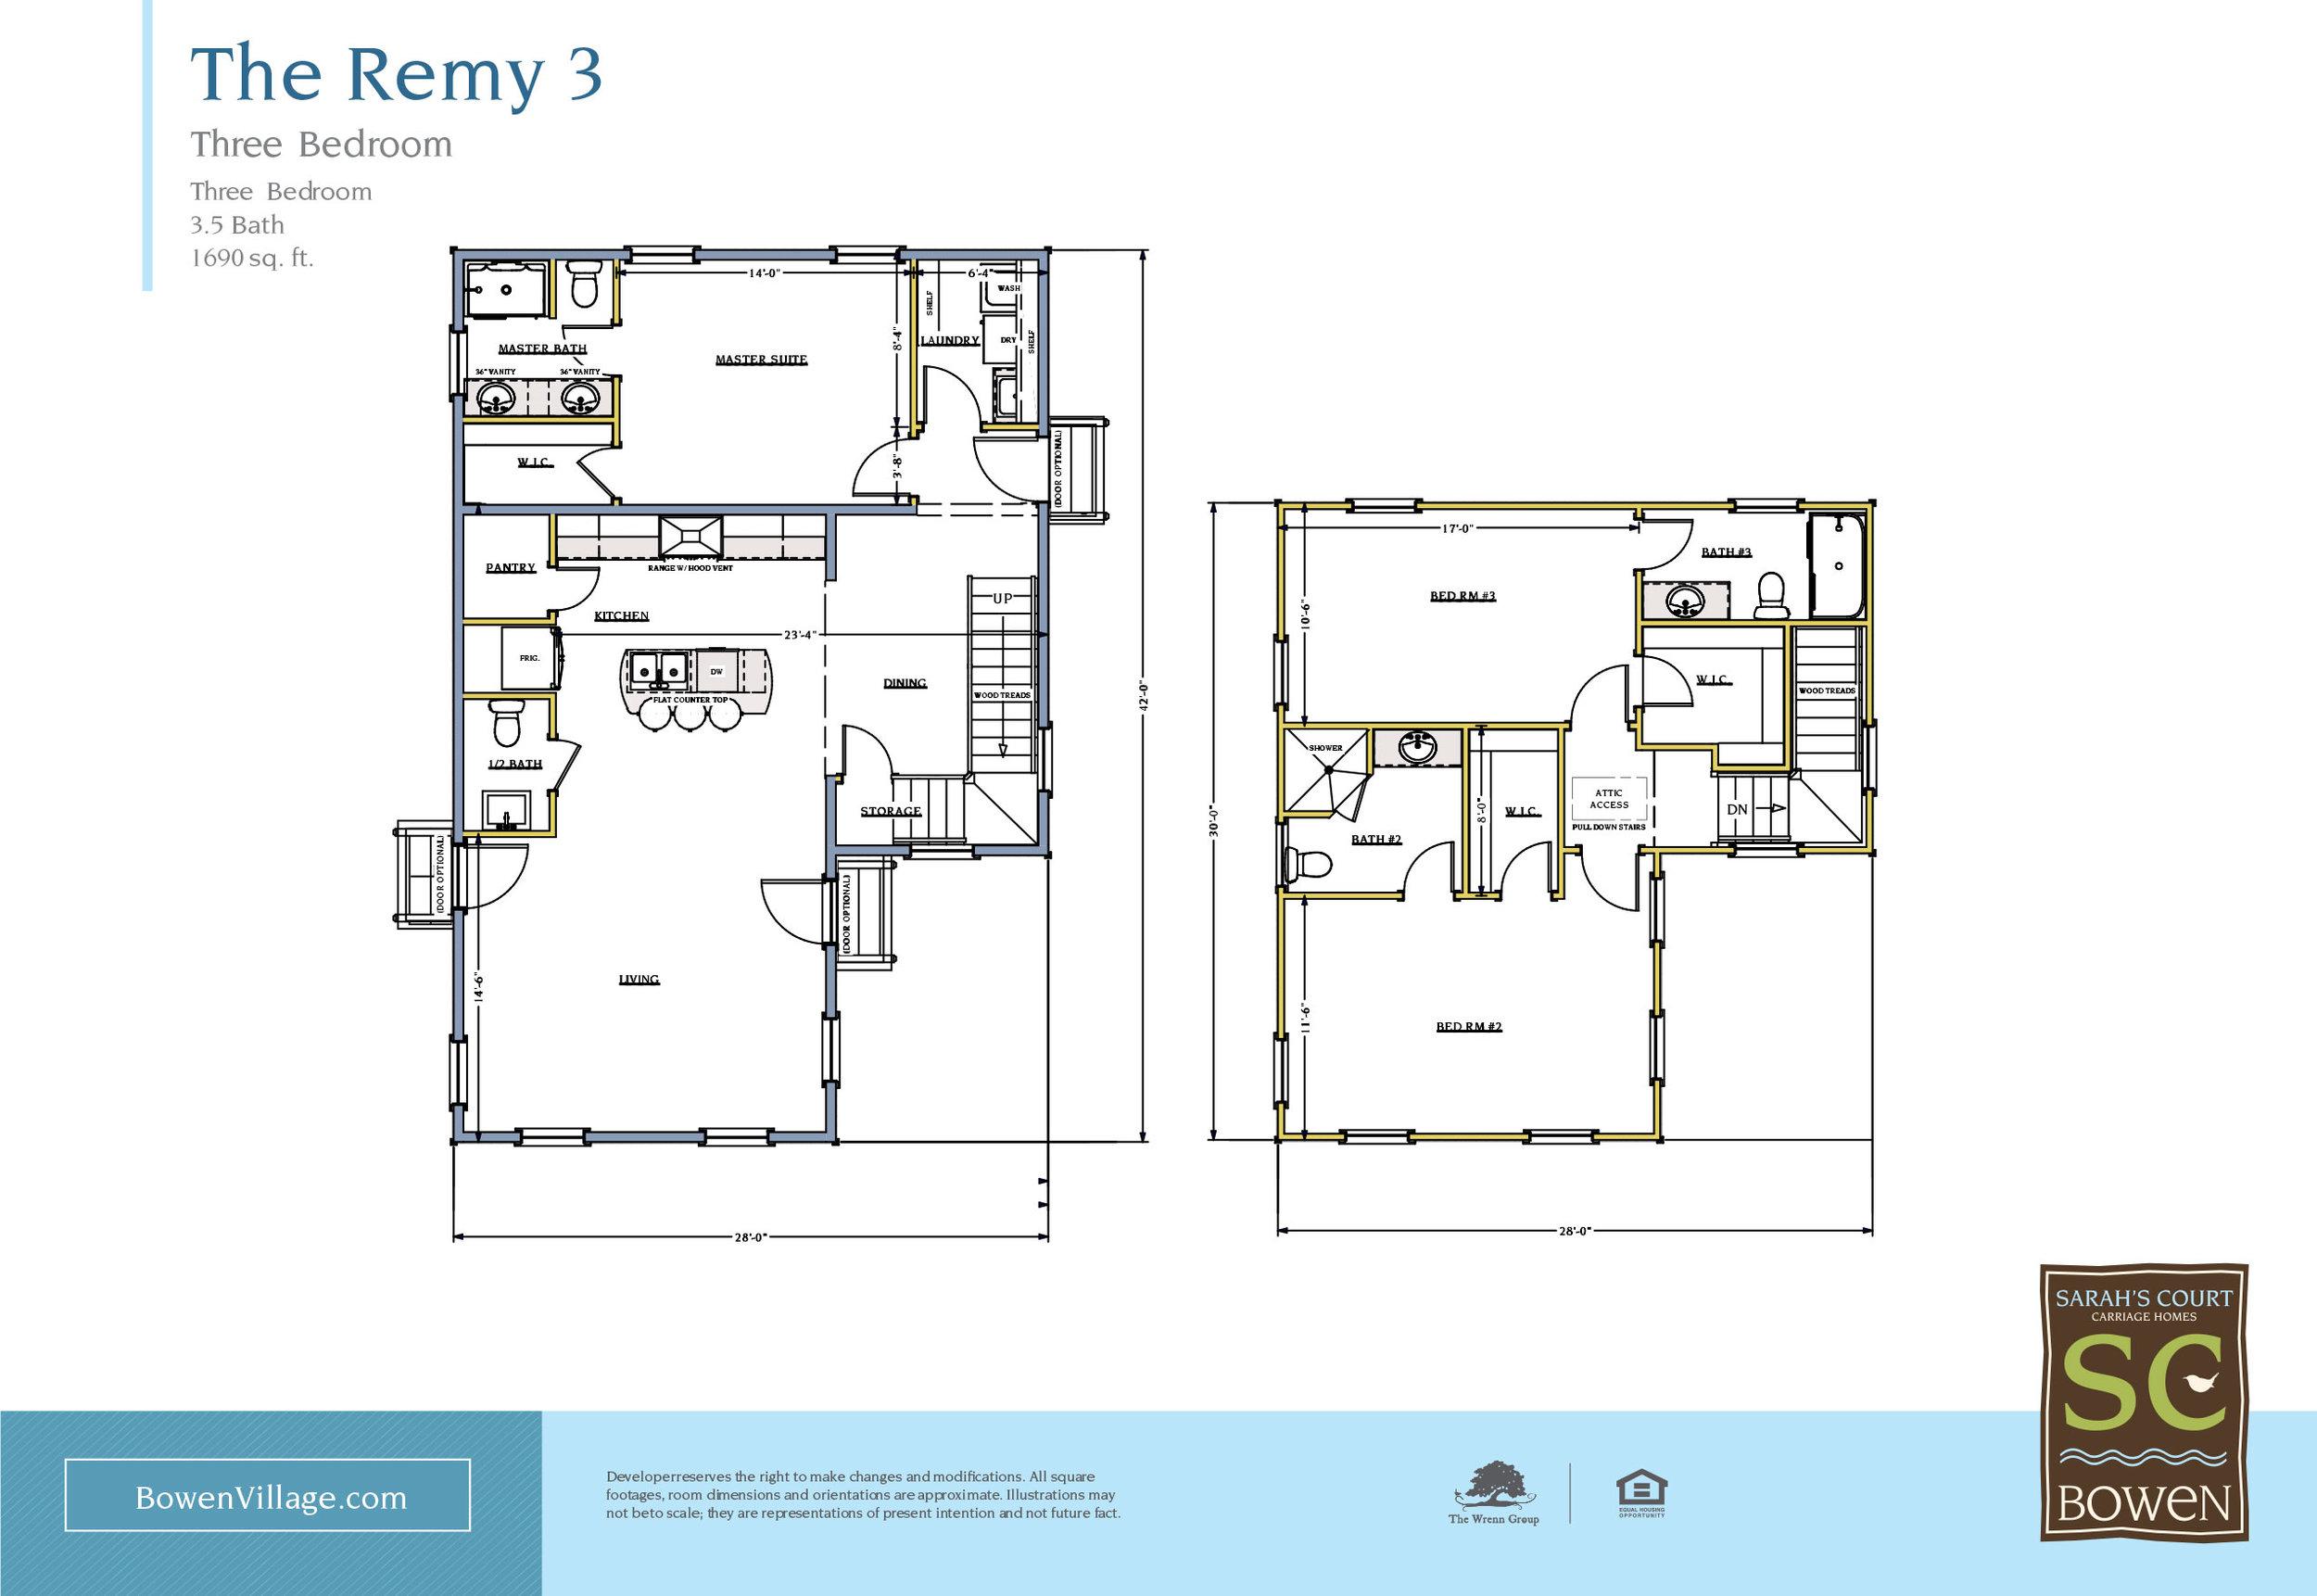 remy3b.jpg